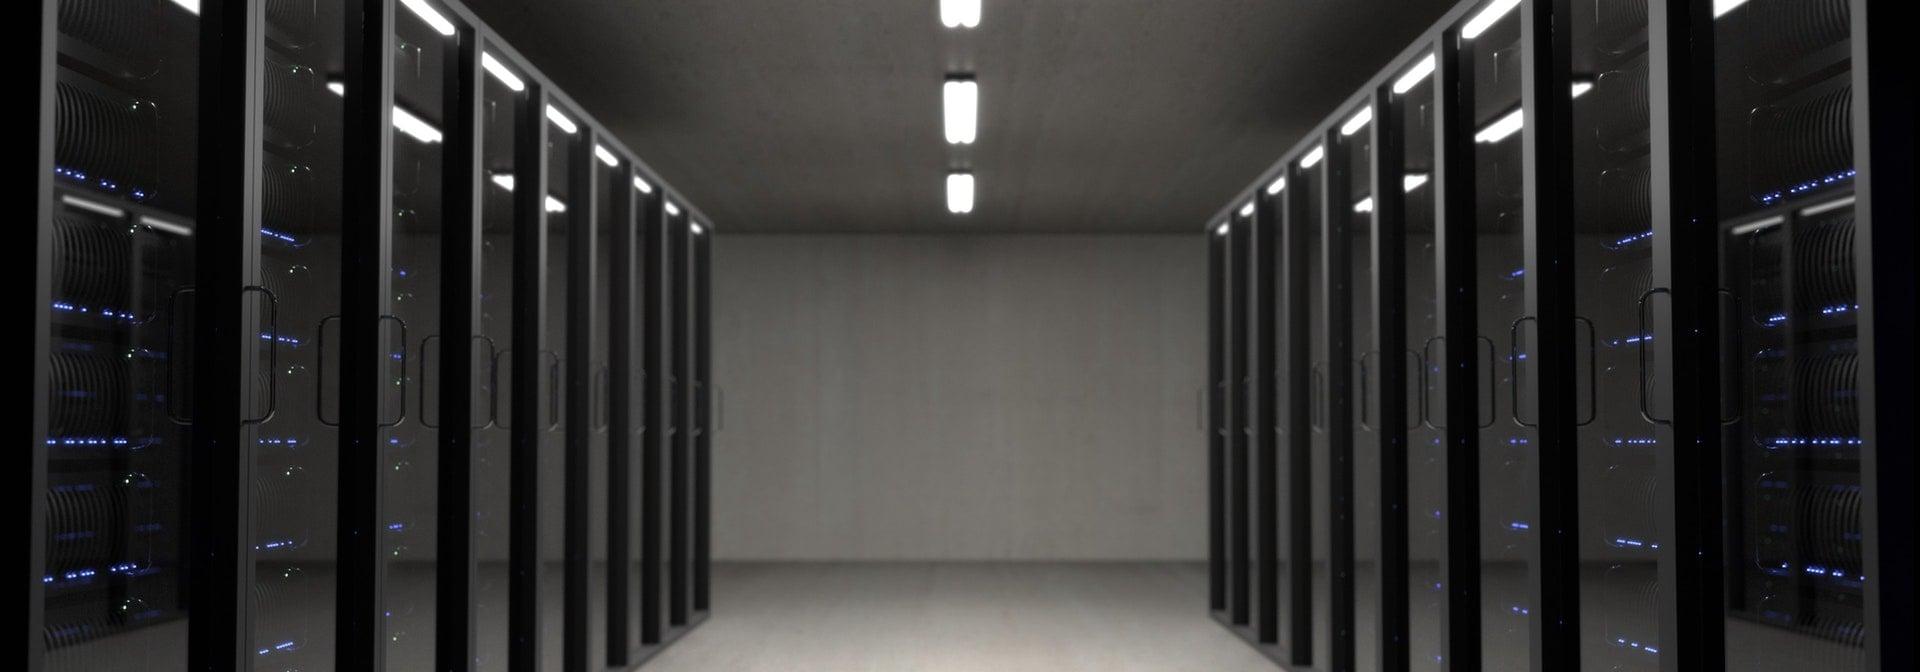 Server room Computer NAS IDC LAB Internet Data Center 在 Google GCP 雲端平台與 Bluehost 架設 WordPress 的網速效能比較